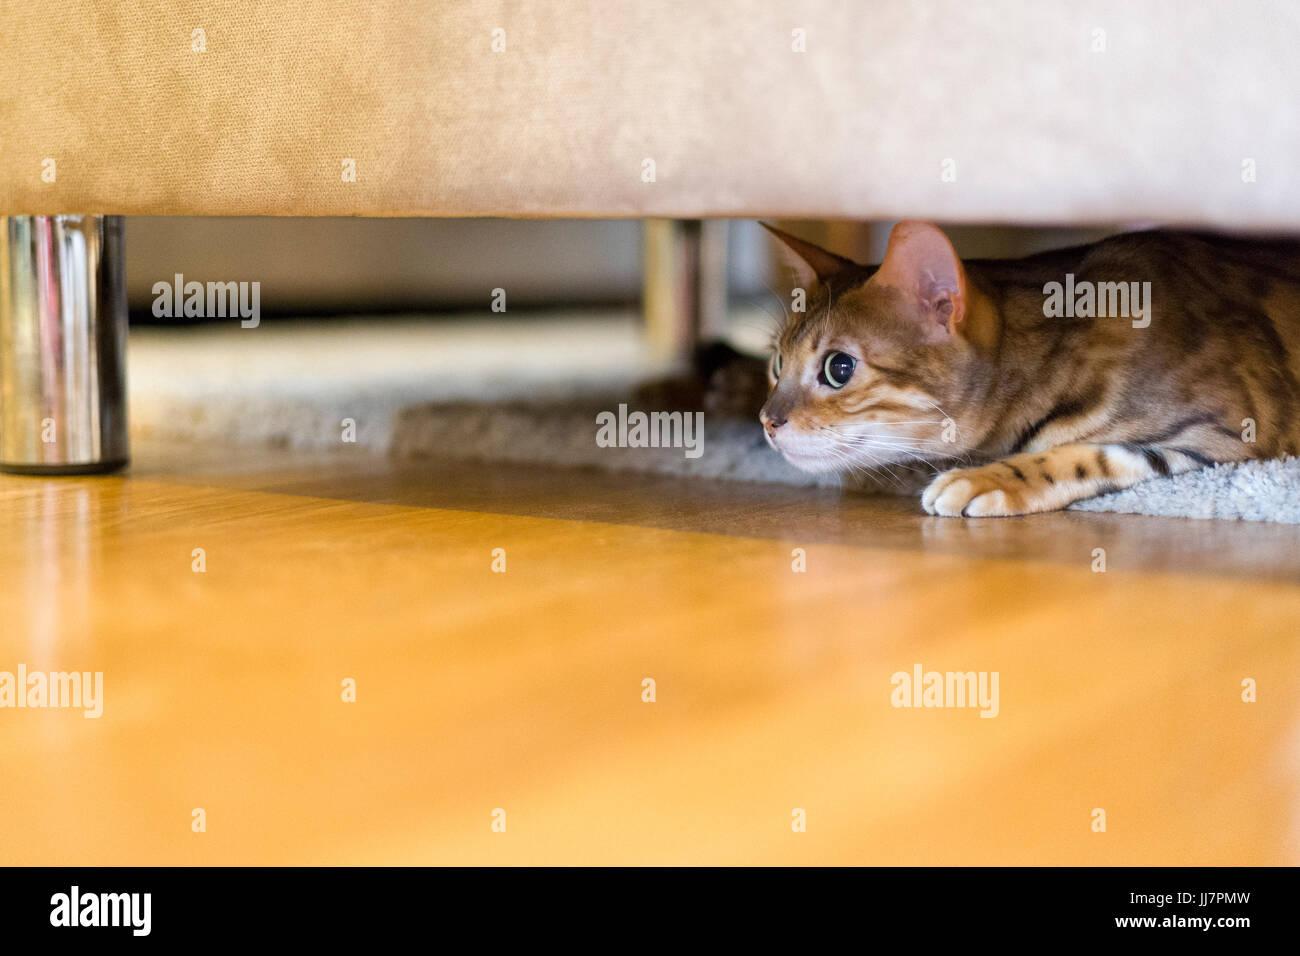 Weibliche Bengalkatze langsam und lautlos unter Sofa zum Angriff bereit, Model Release: Nein Property Release: Nein. Stockbild